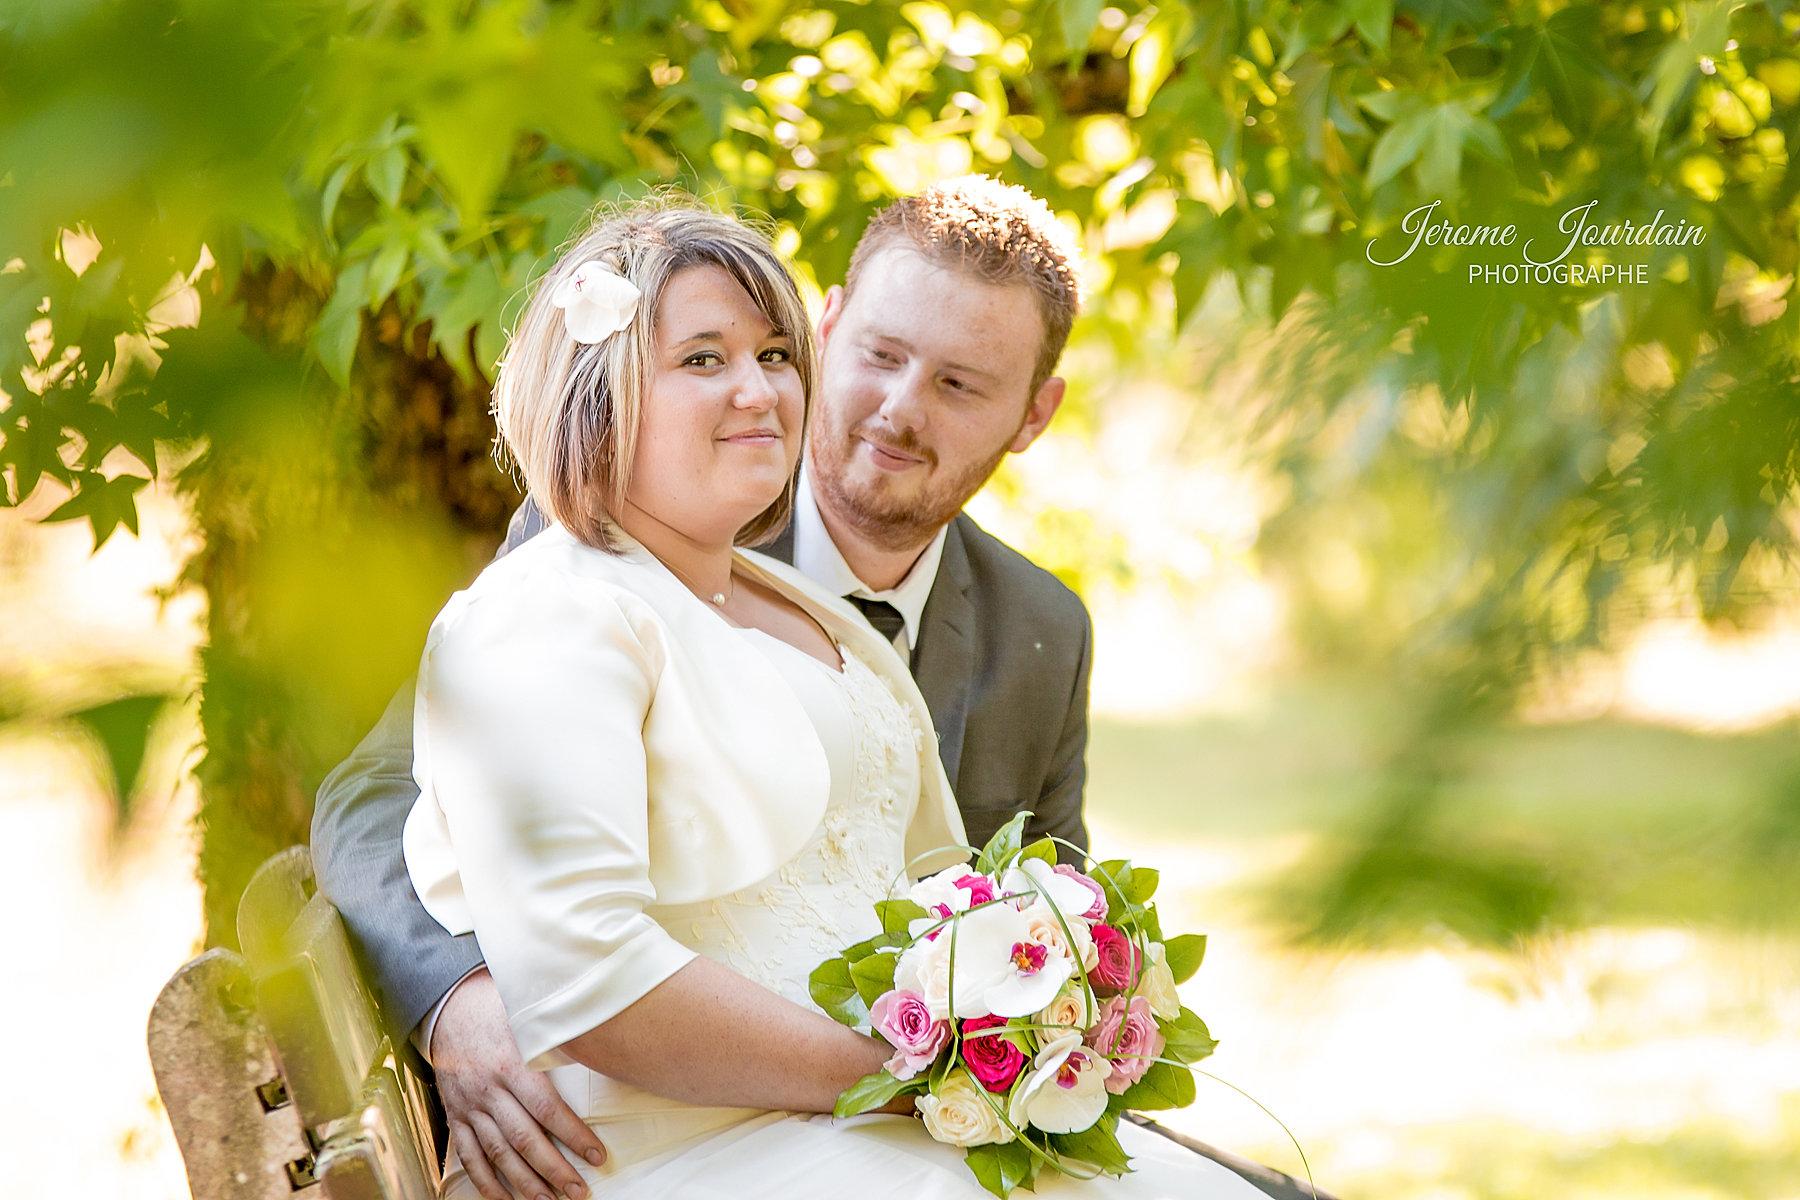 jerome jourdain photographe dordogne gironde jerome jourdain photographe mariage dordogne gironde 4 - Photographe Mariage Dordogne